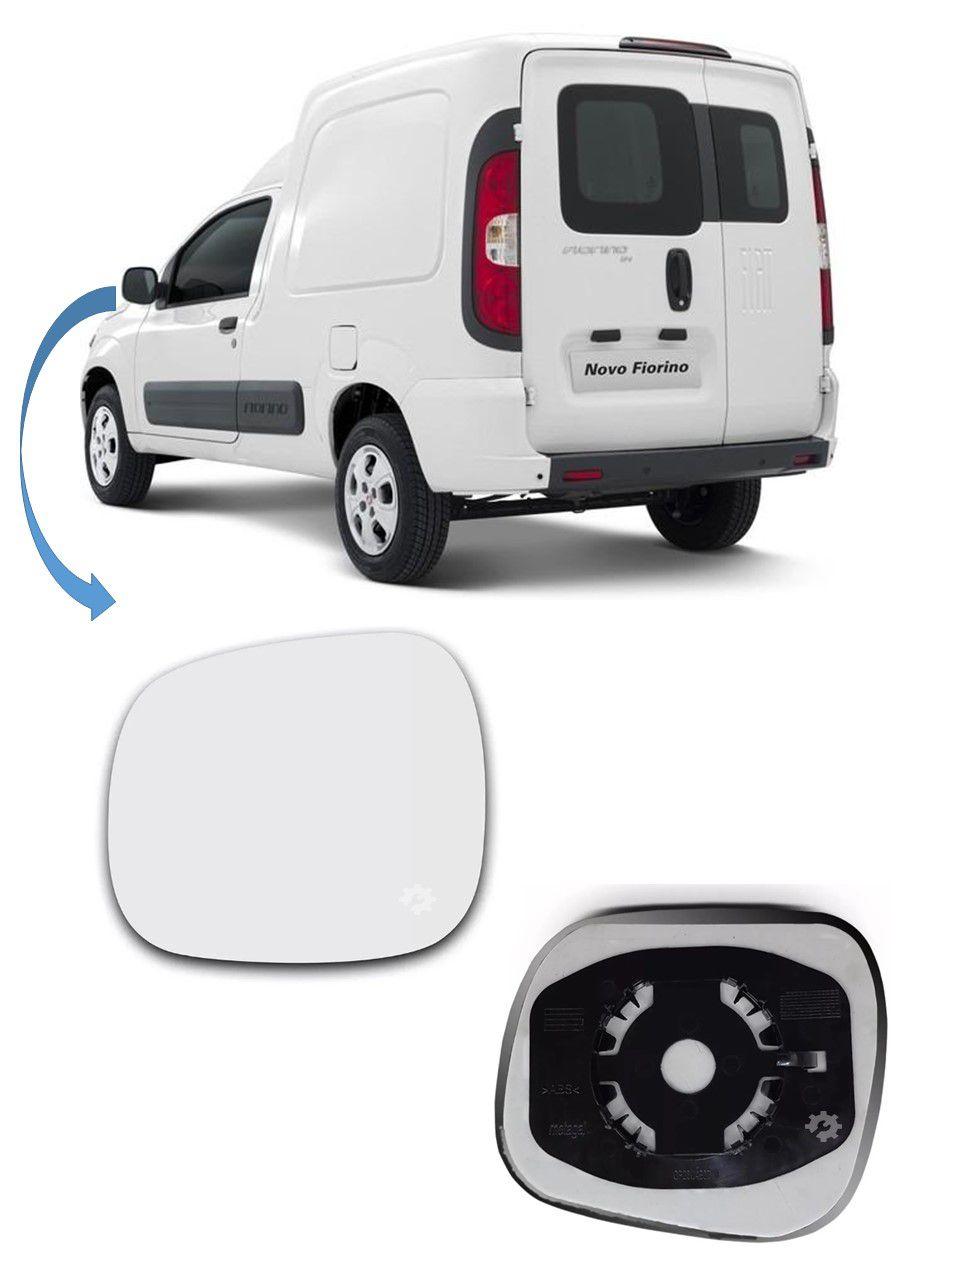 Lente Vidro base Retrovisor Esquerdo Fiat Fiorino 2014 2019